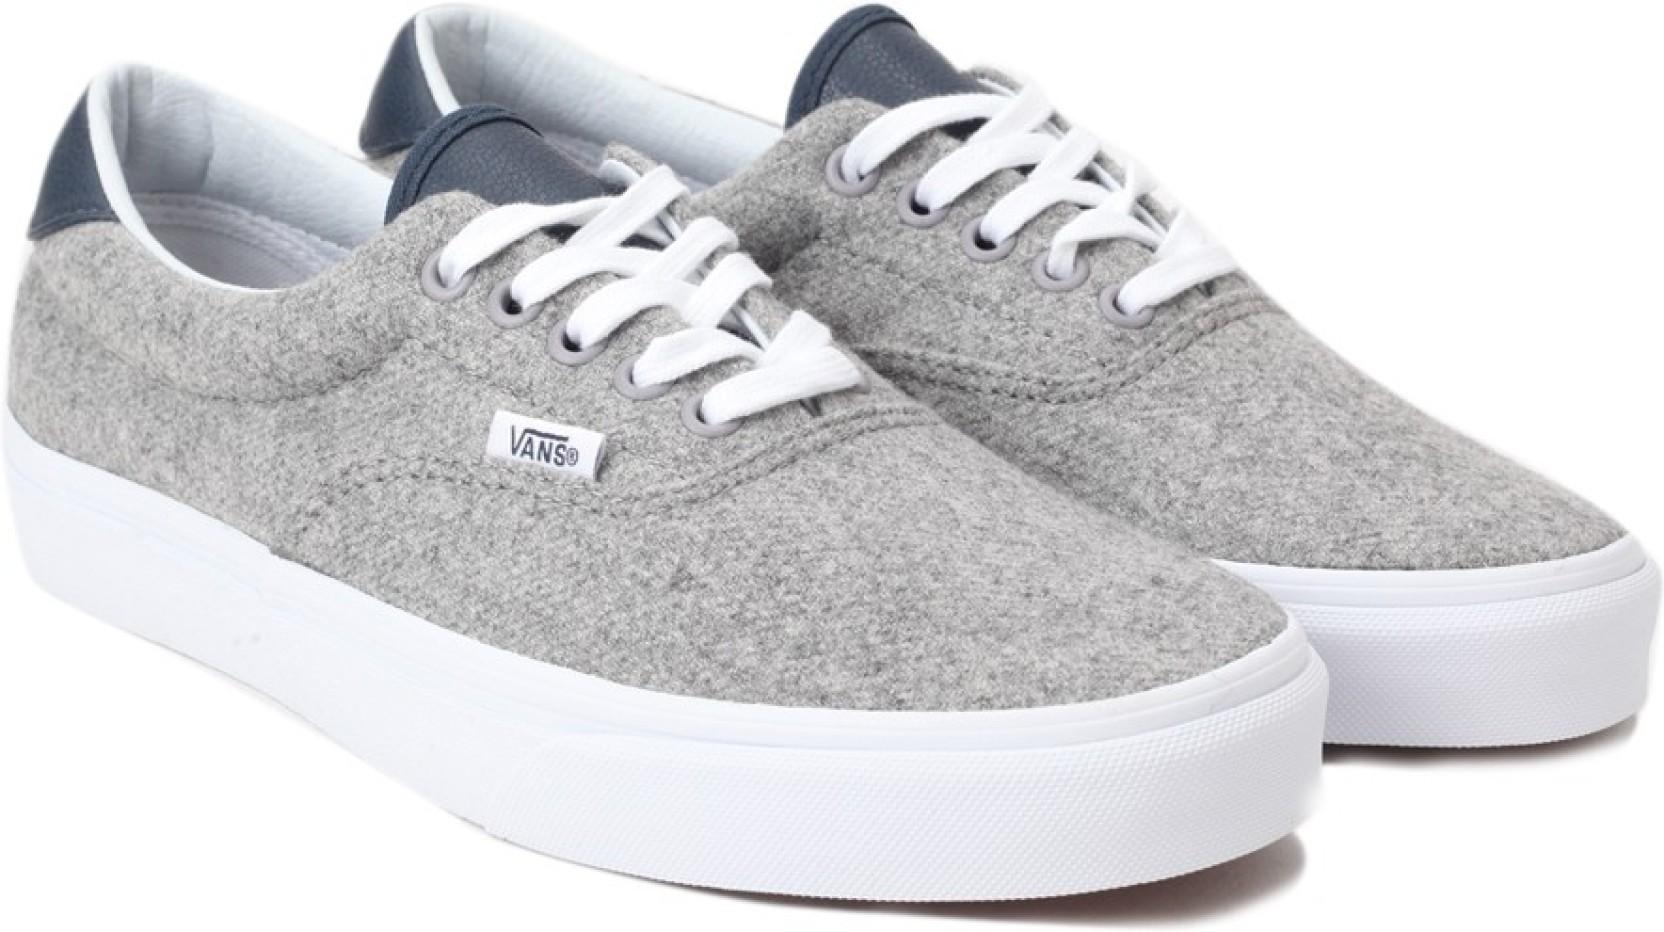 Vans Era 59 Sneakers For Men - Buy Grey Color Vans Era 59 Sneakers ... 588d493fb